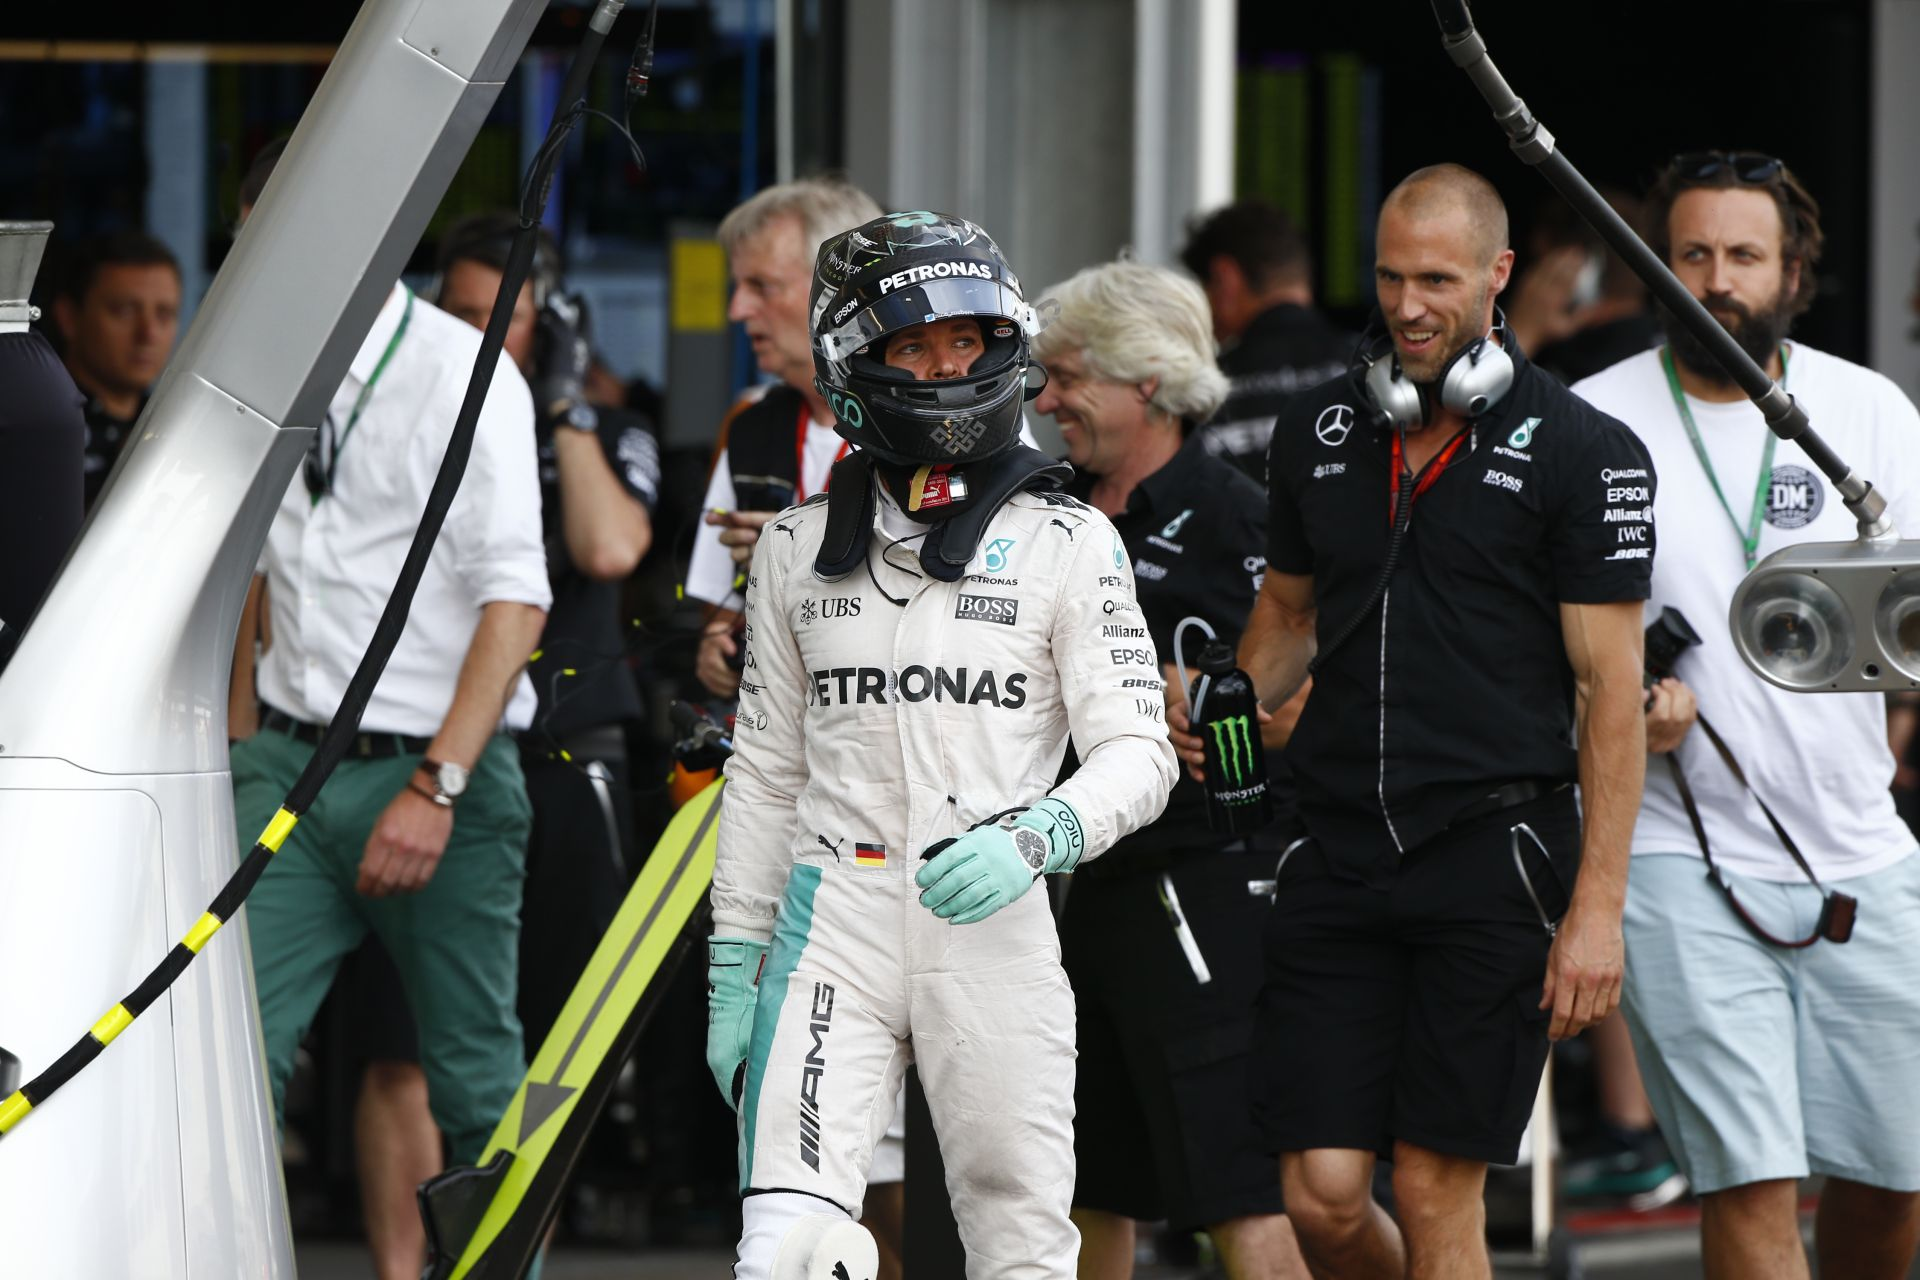 Rosberg megpörgette a 2014-es Mercedest Goodwoodban